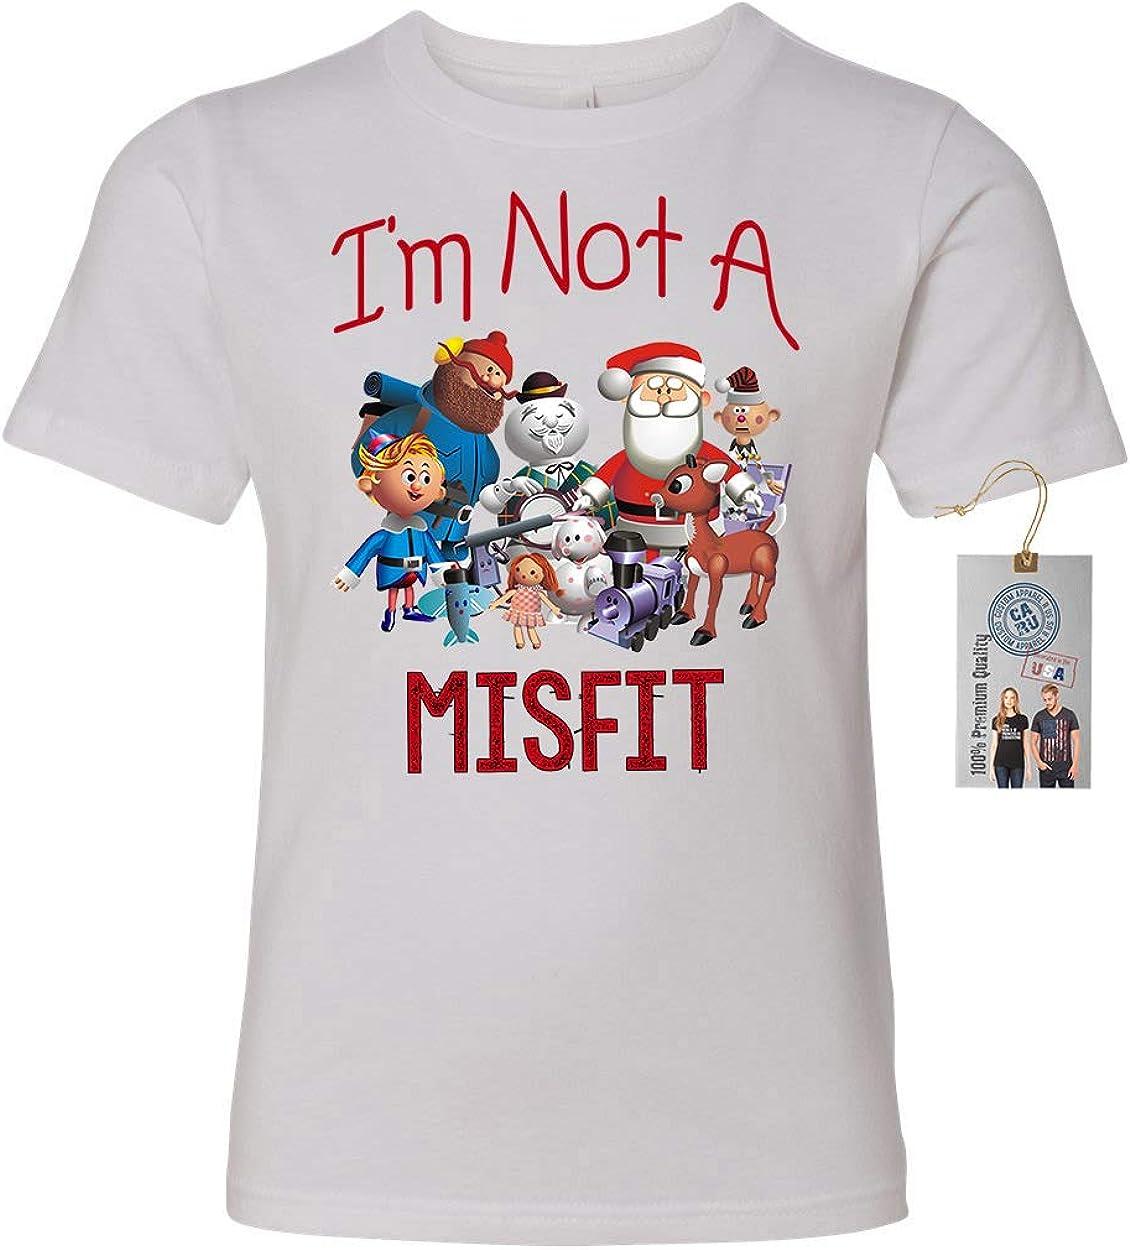 Not A Misfit Toy Girls Boys Short Sleeve